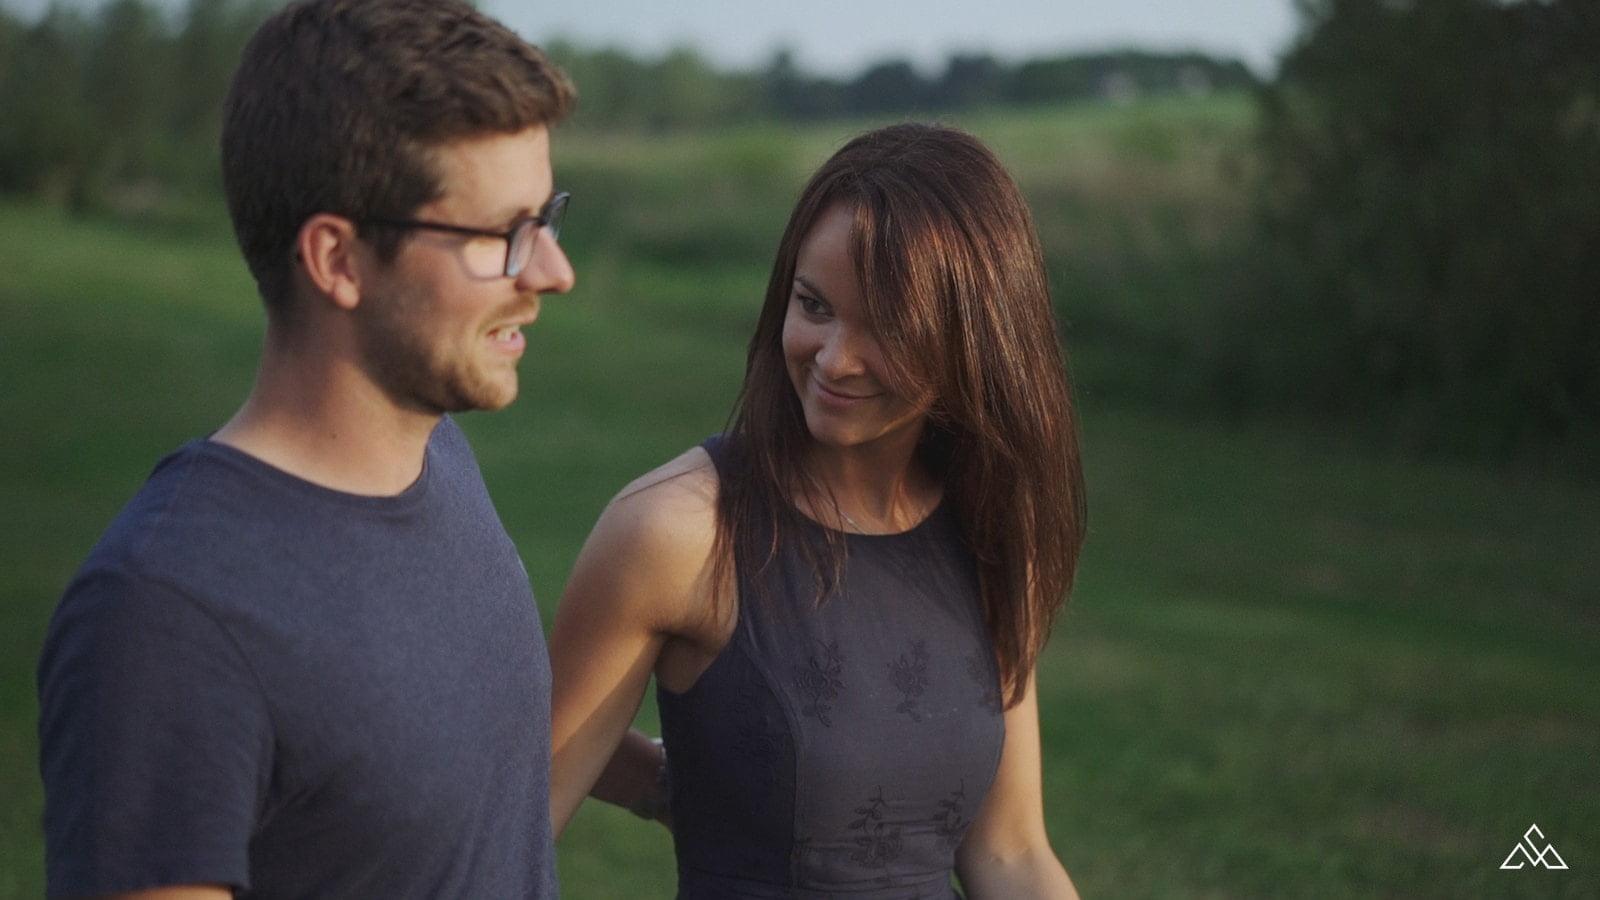 suffolk engagement love story sarah matthew